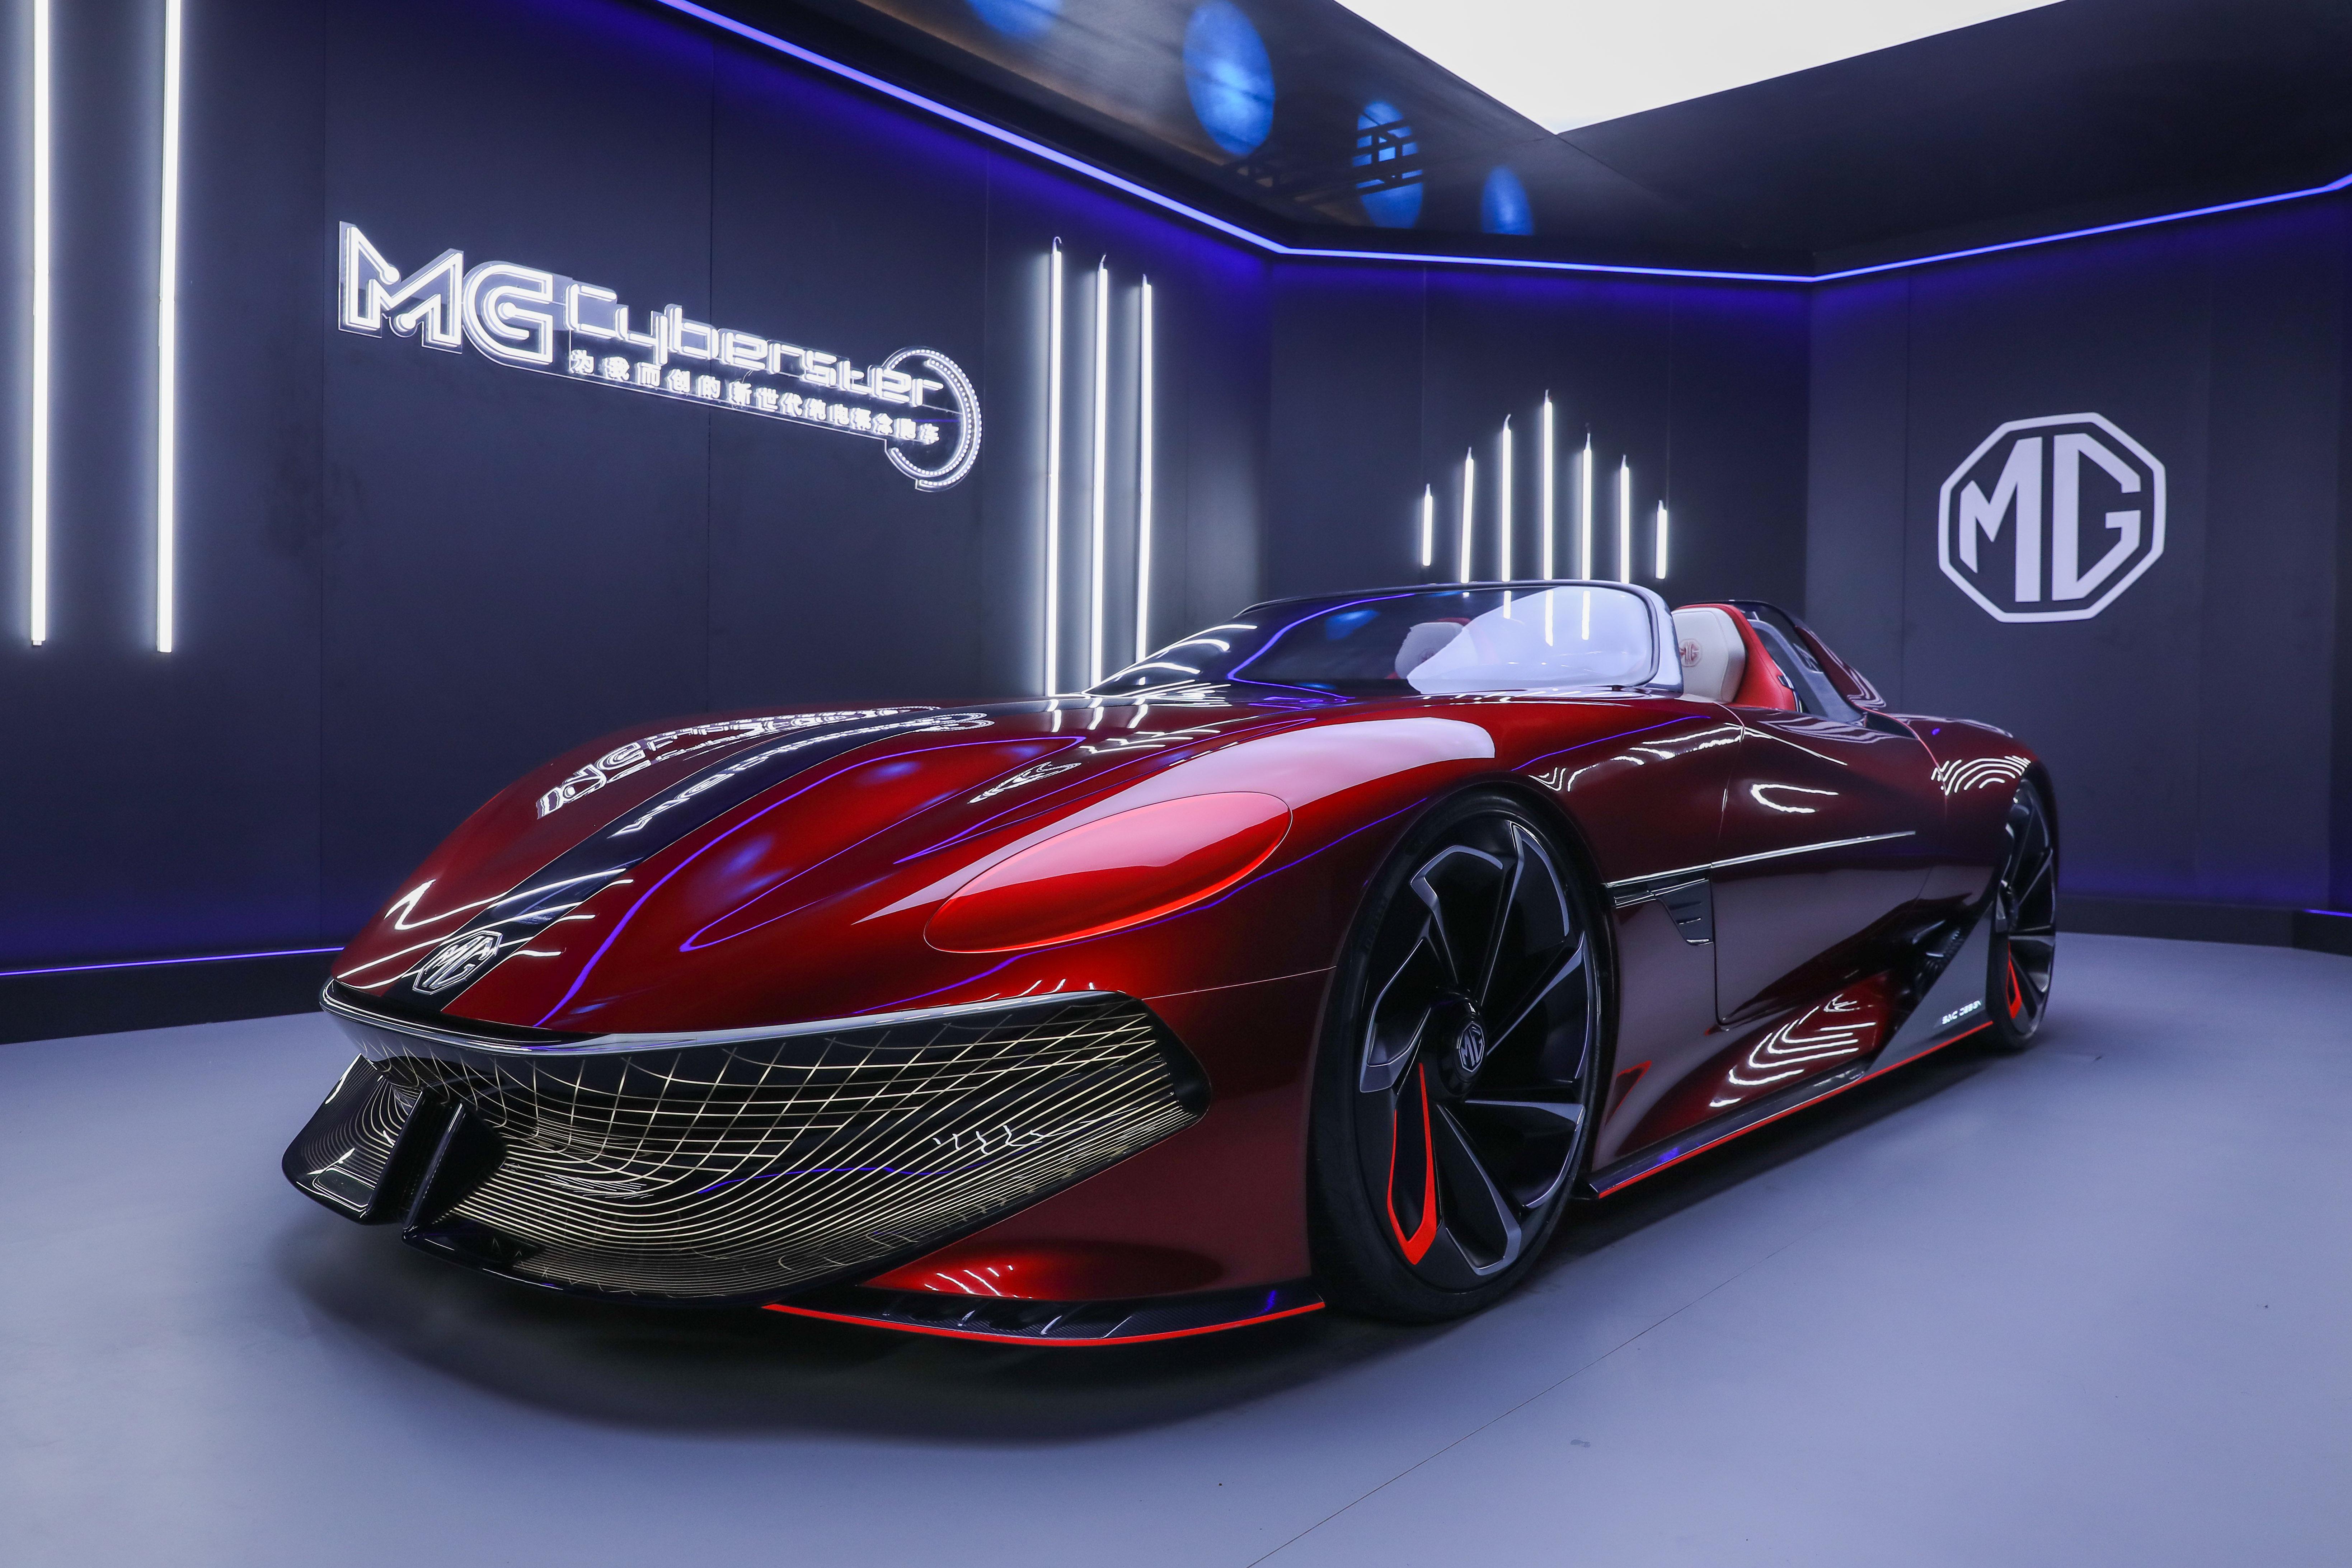 mg cyberster concept 2021 4k 1620170764 - MG Cyberster Concept 2021 4k - MG Cyberster Concept 2021 4k wallpapers